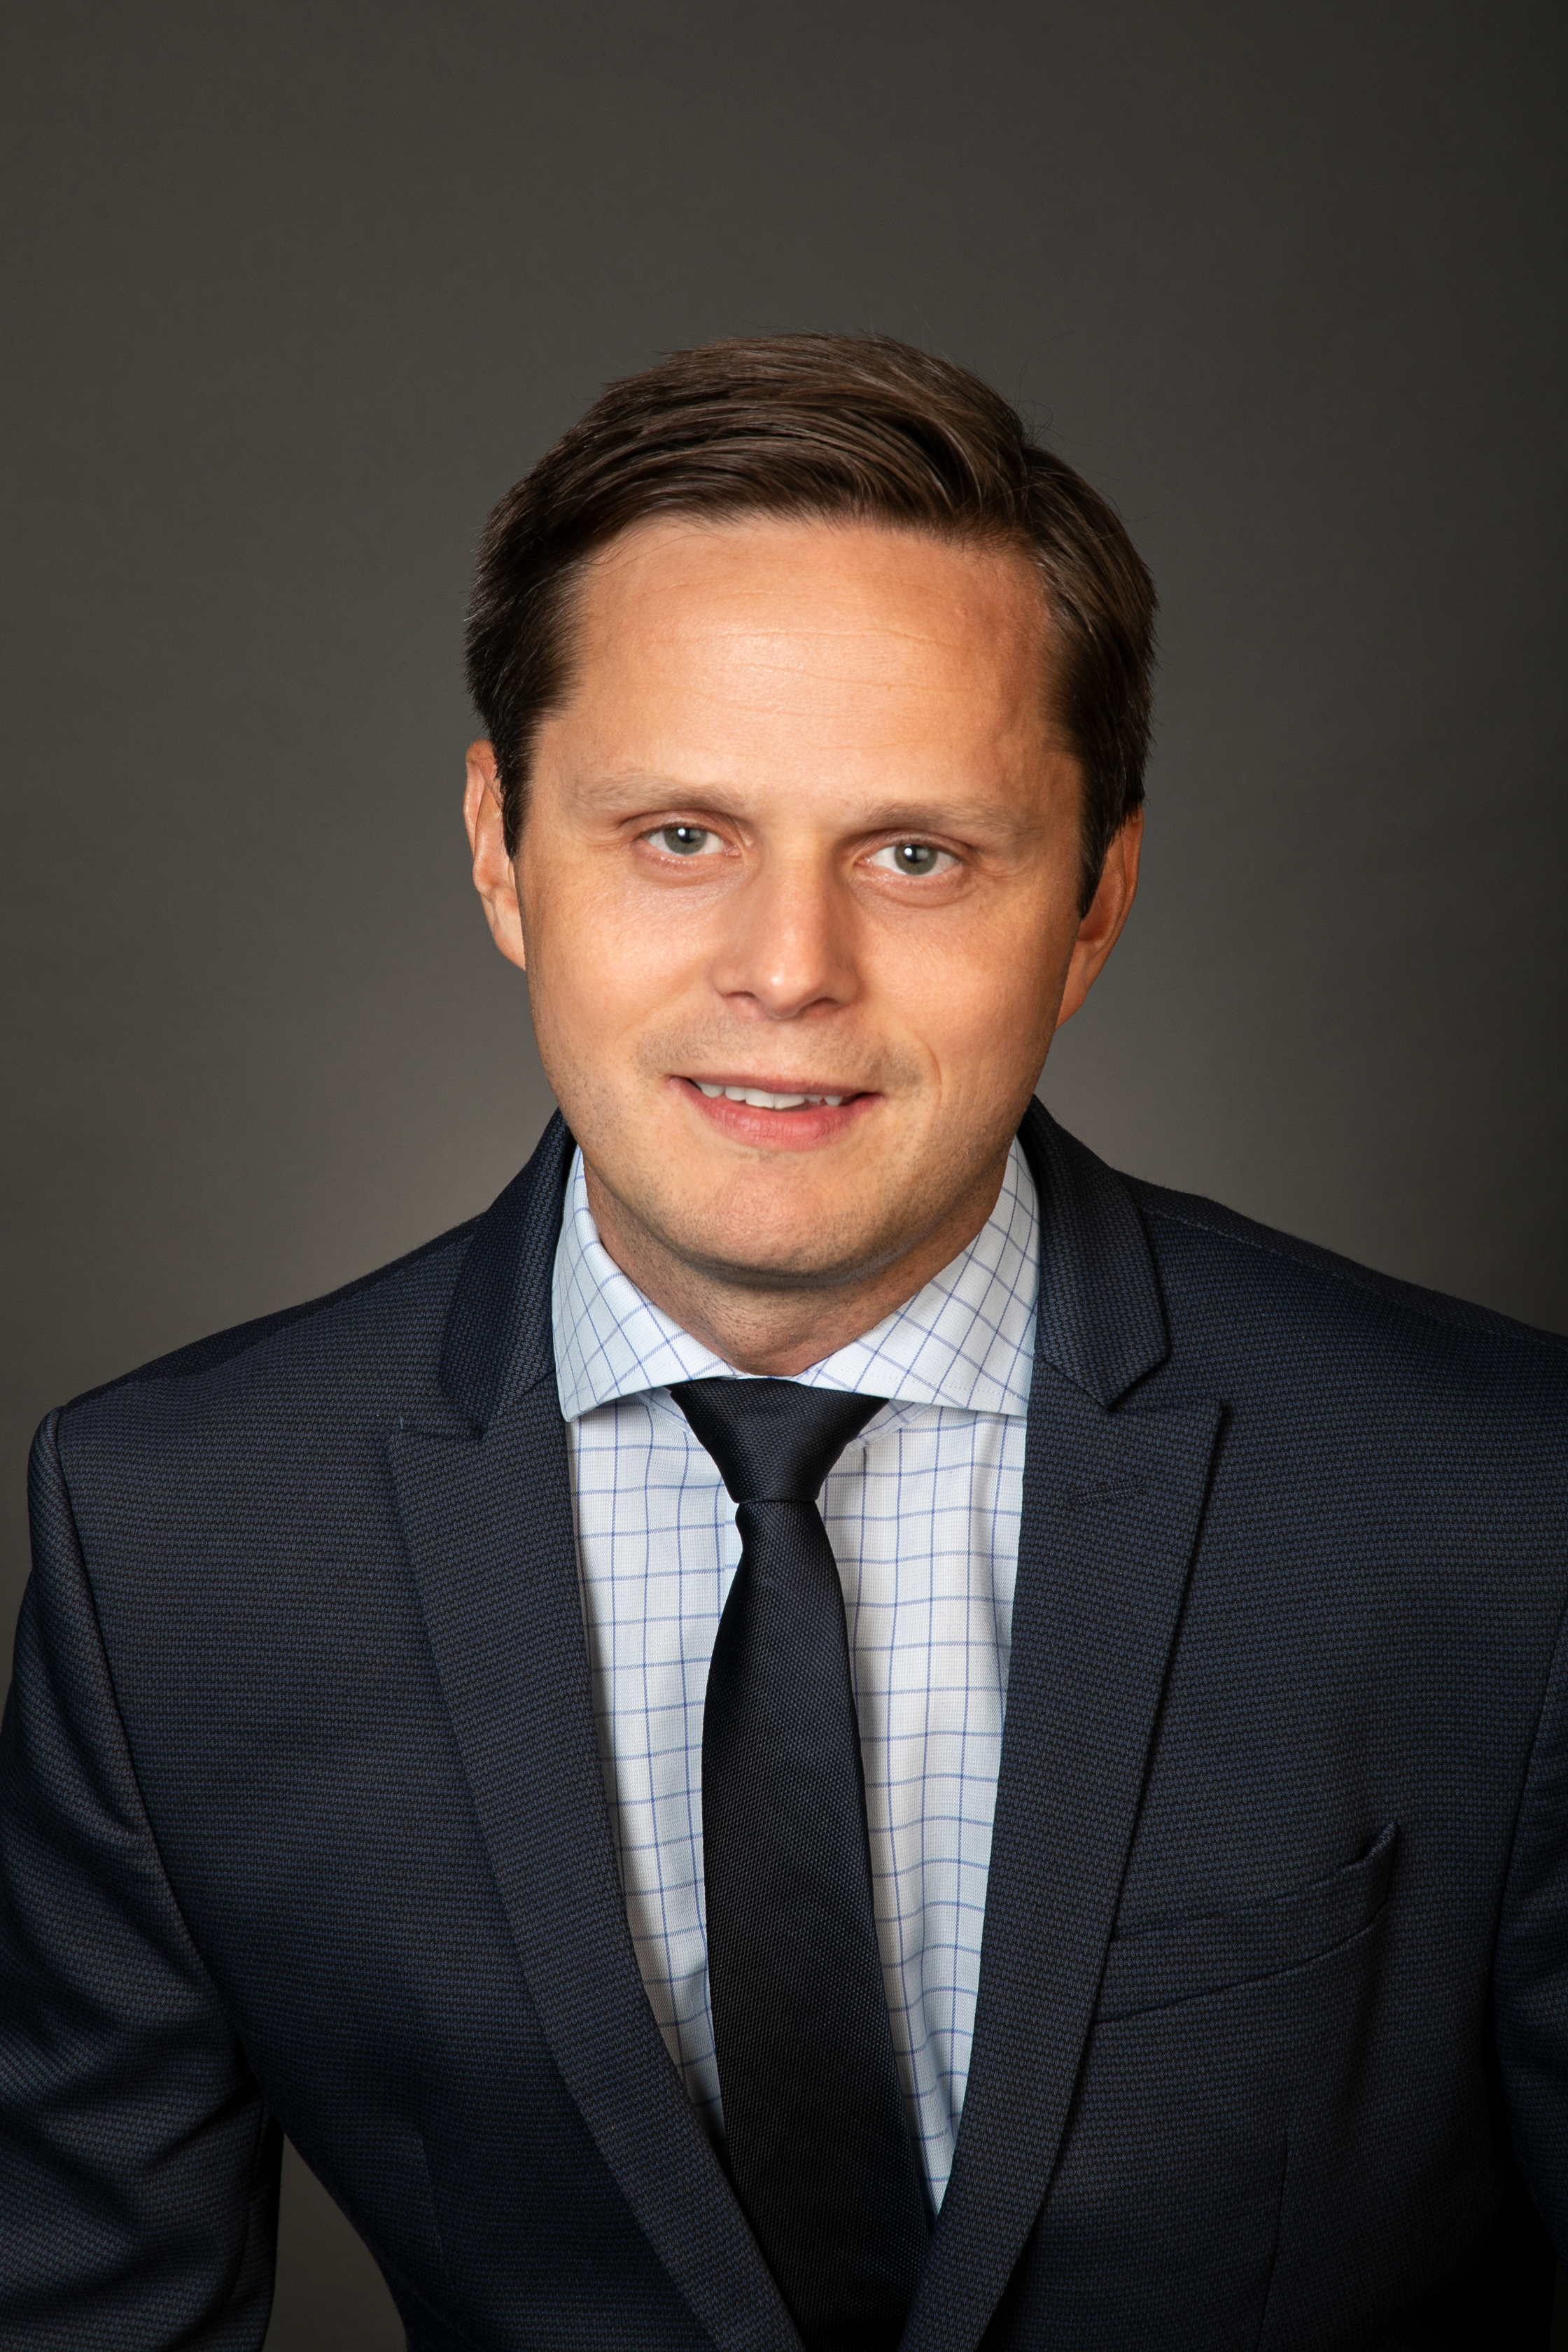 Hans Petter Ovrevik